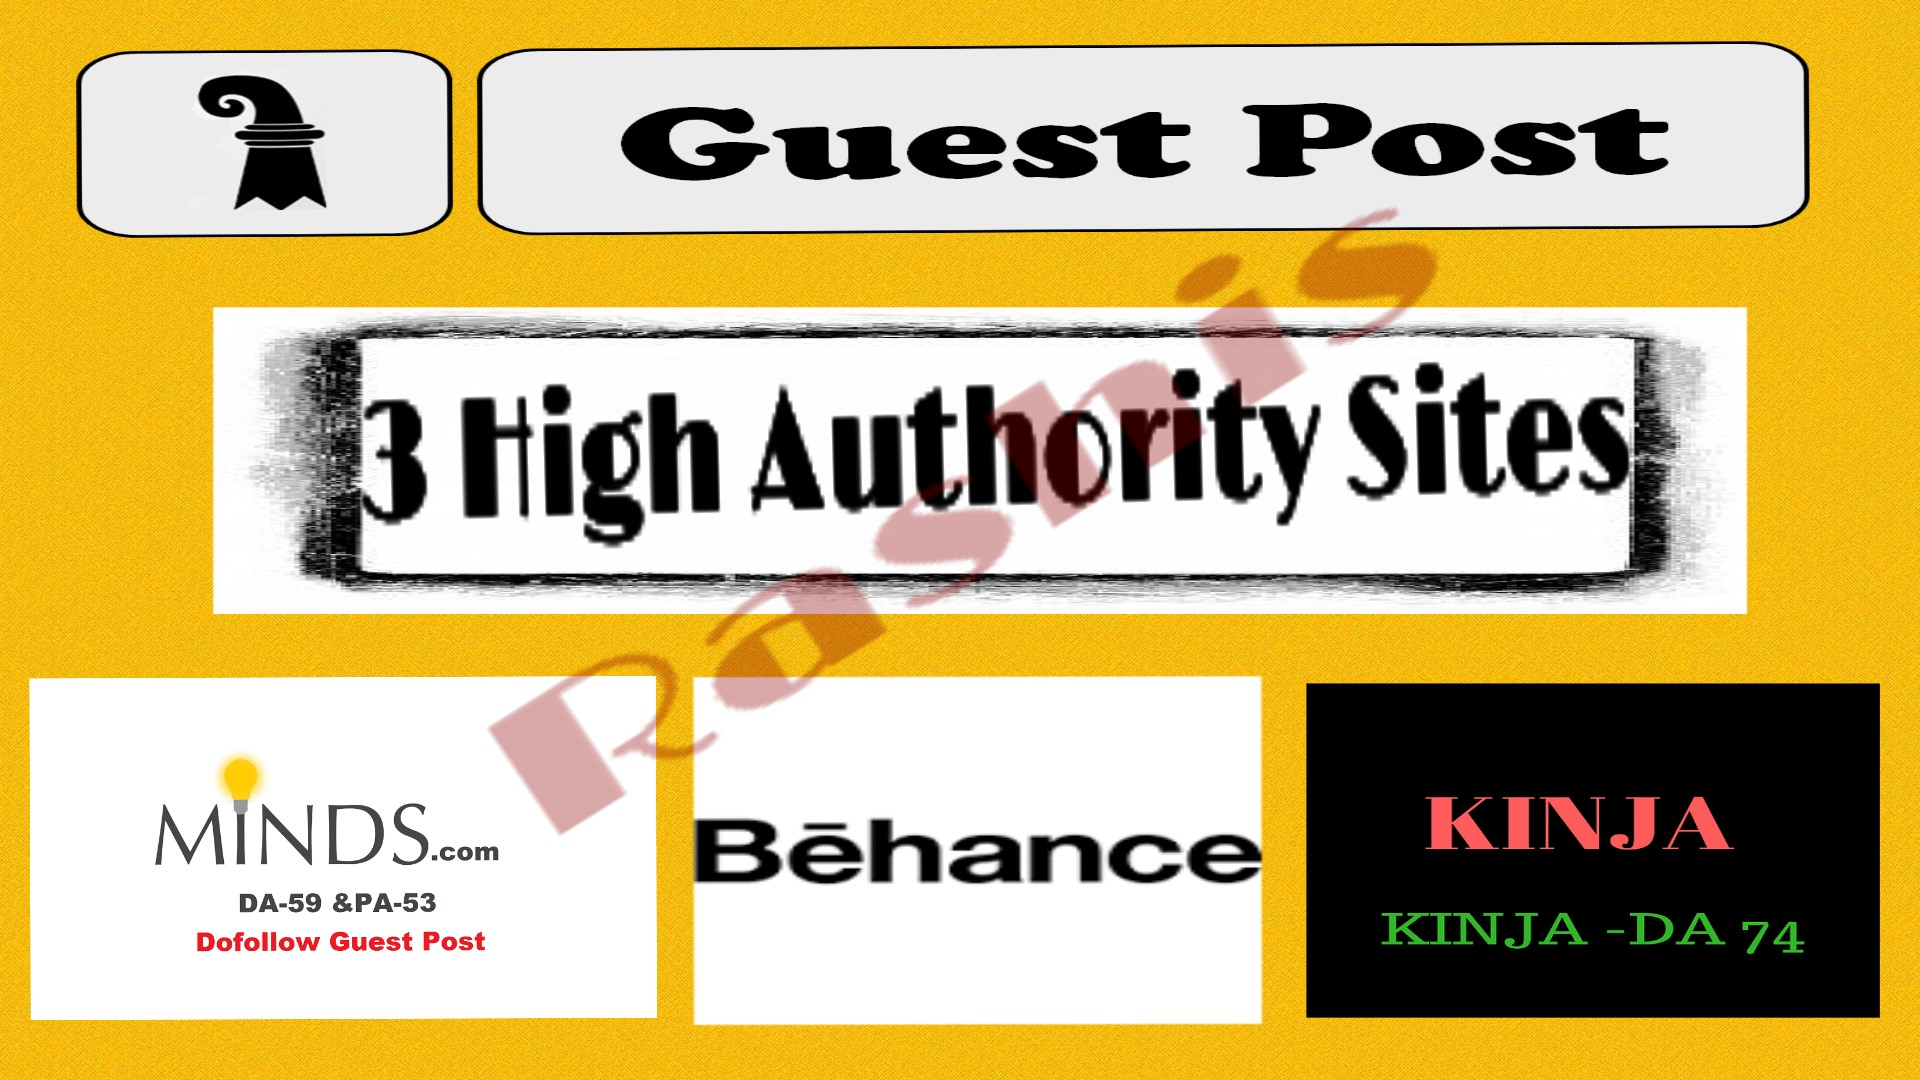 [Bumper offer] write & publish Guest Post On Minds+Behance+Kinja